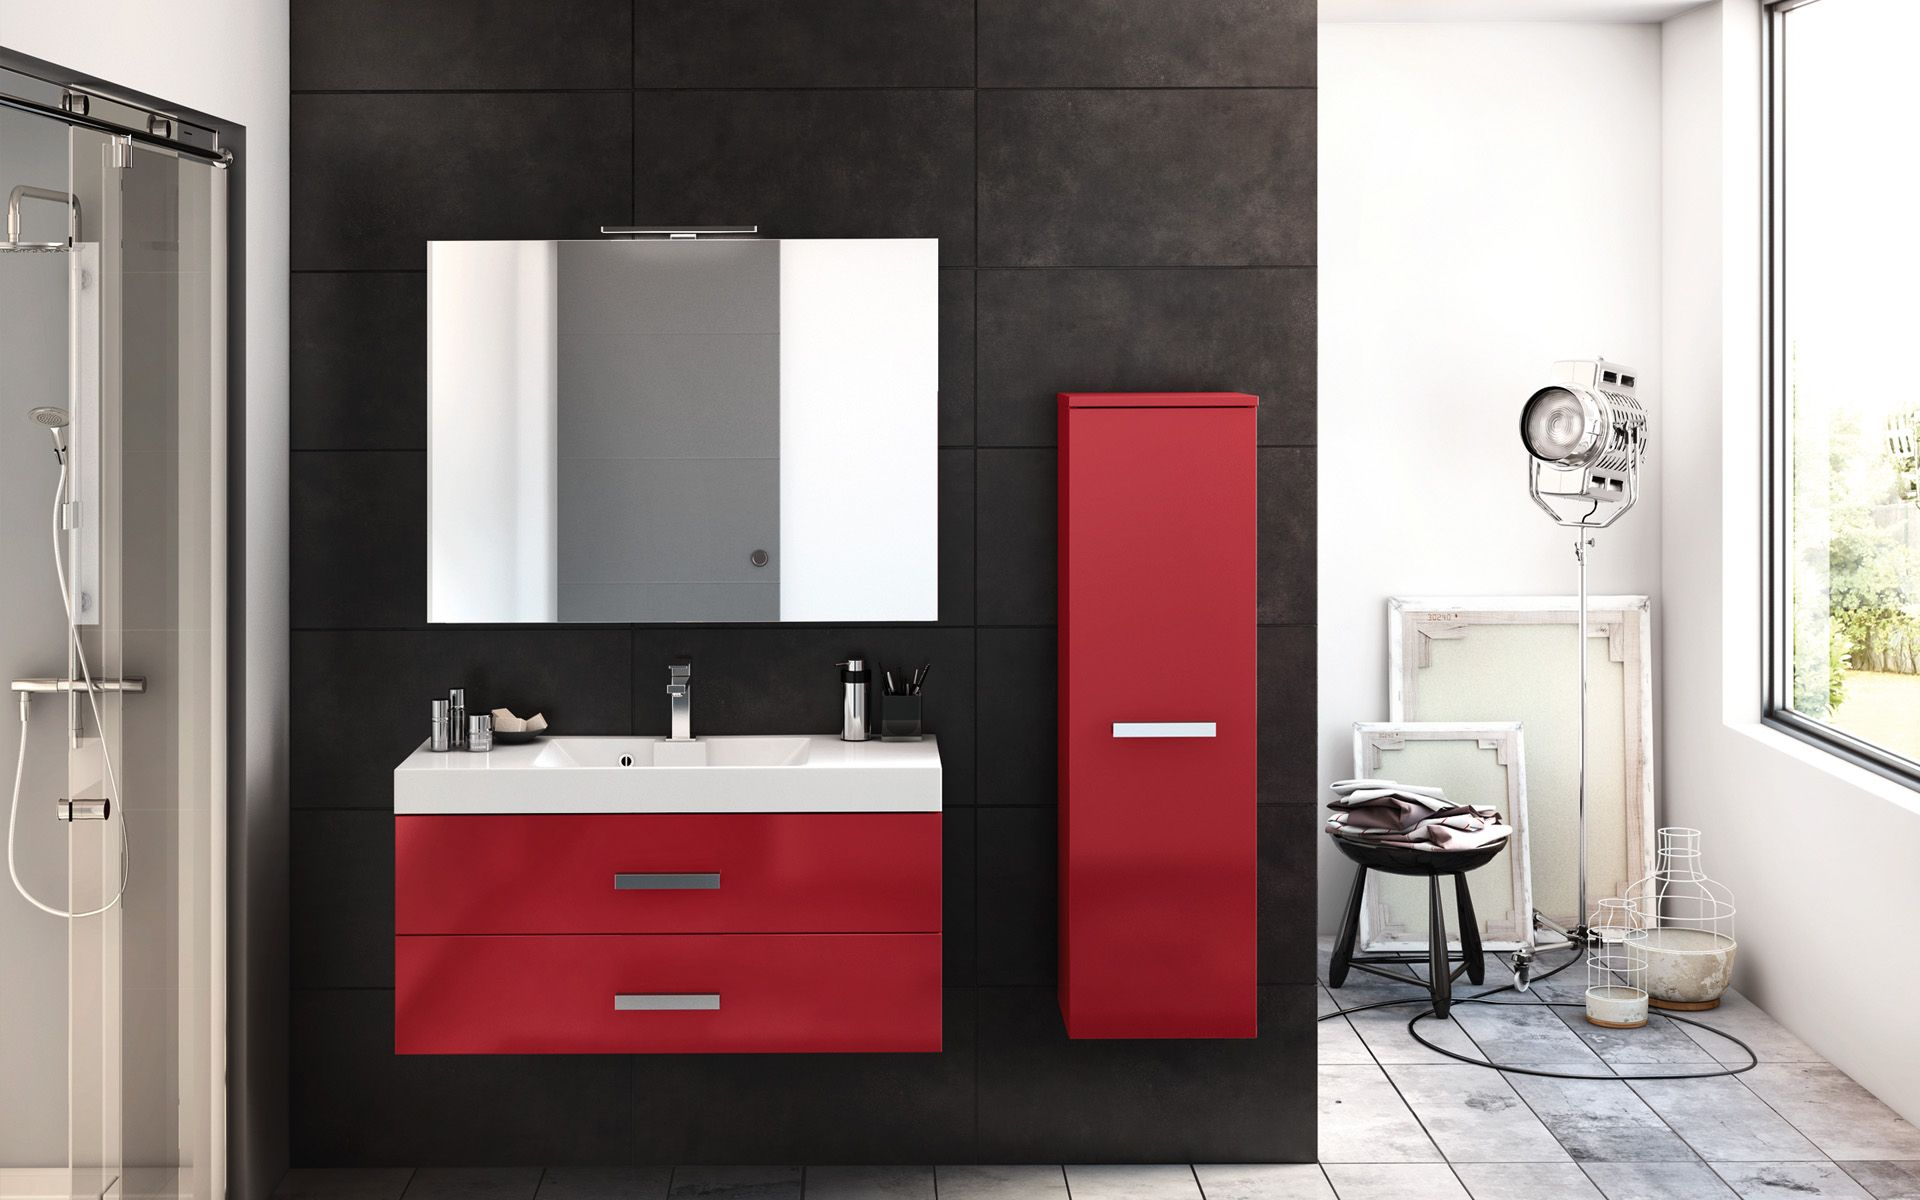 Salle De Bain Parement Baignoire ~ decotec obbo meuble salledebain red rouge red pinterest